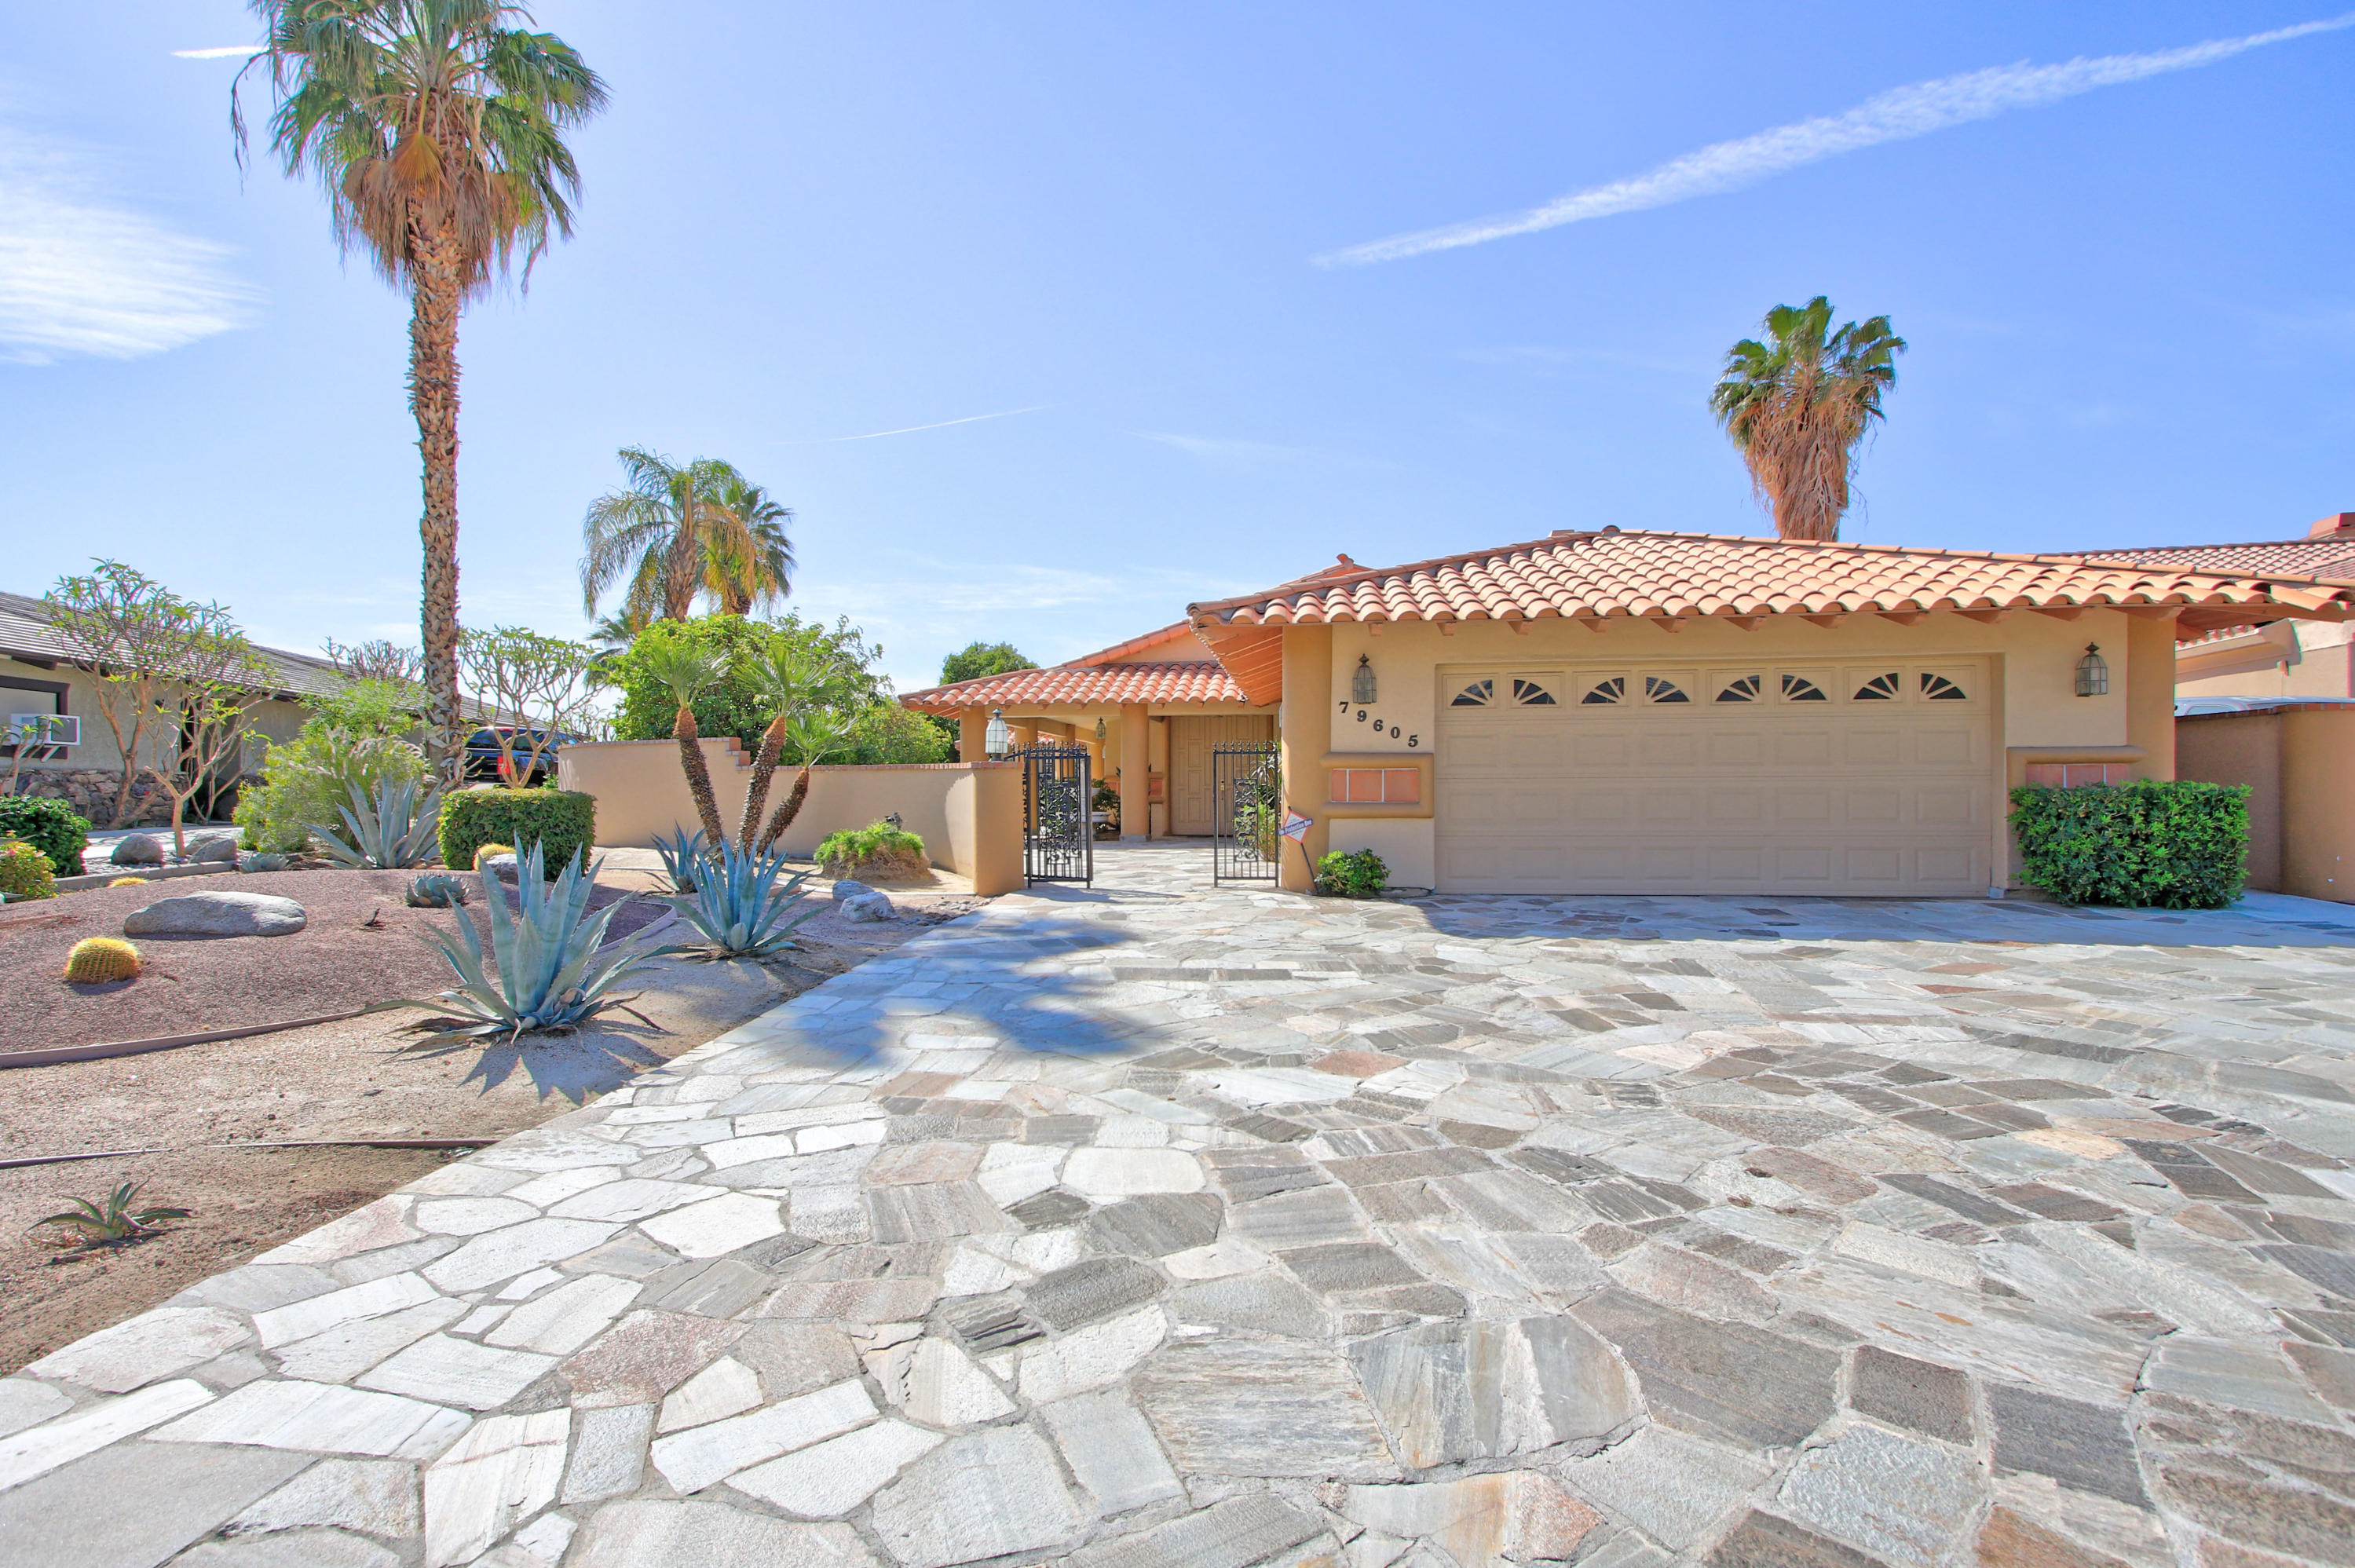 Photo of 79605 Cortez Lane, La Quinta, CA 92253